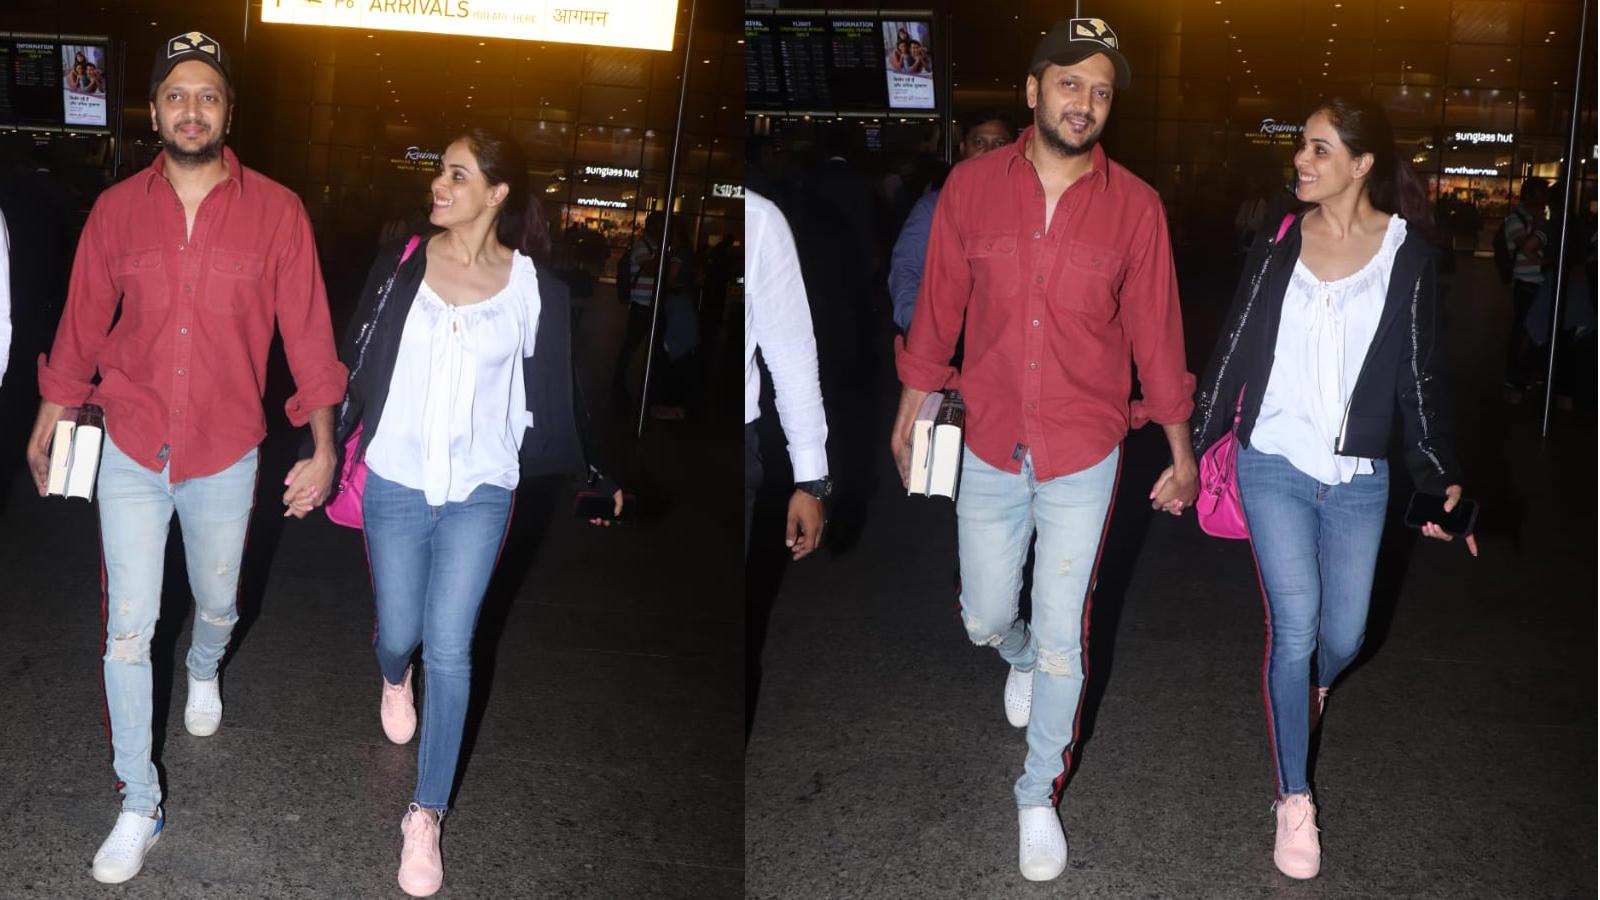 Couple goals! Riteish Deshmukh, Genelia D'Souza look cute together